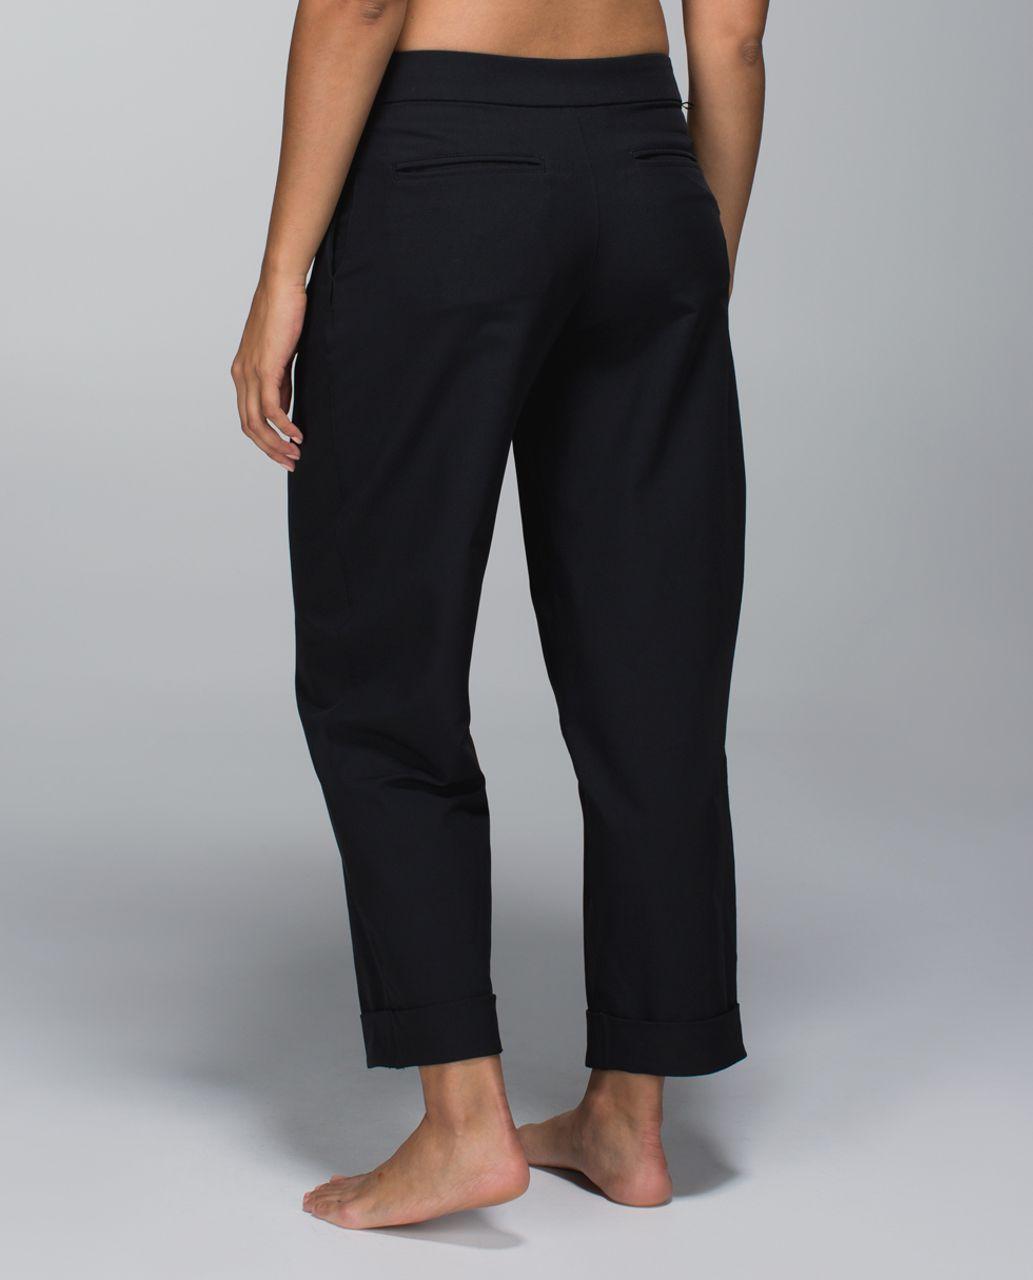 Lululemon Wide Legged Wonder Pant